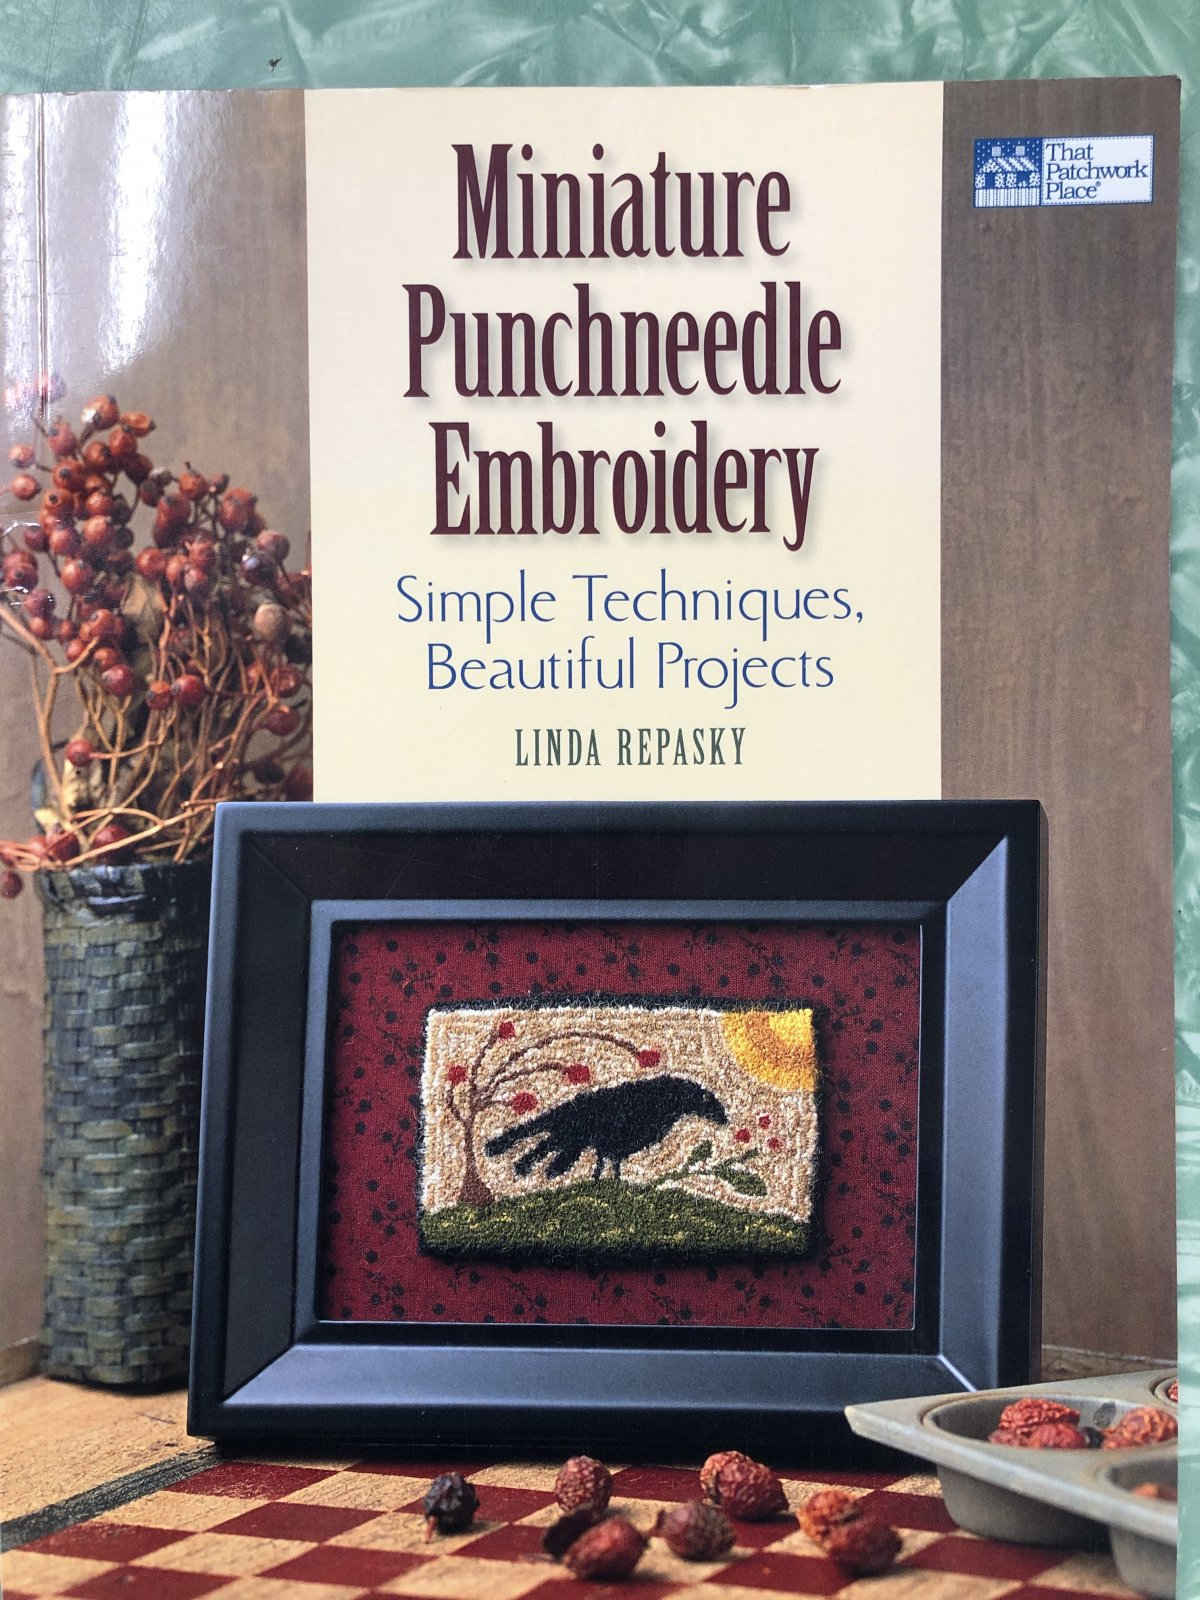 Miniature Punchneedle Embroidery